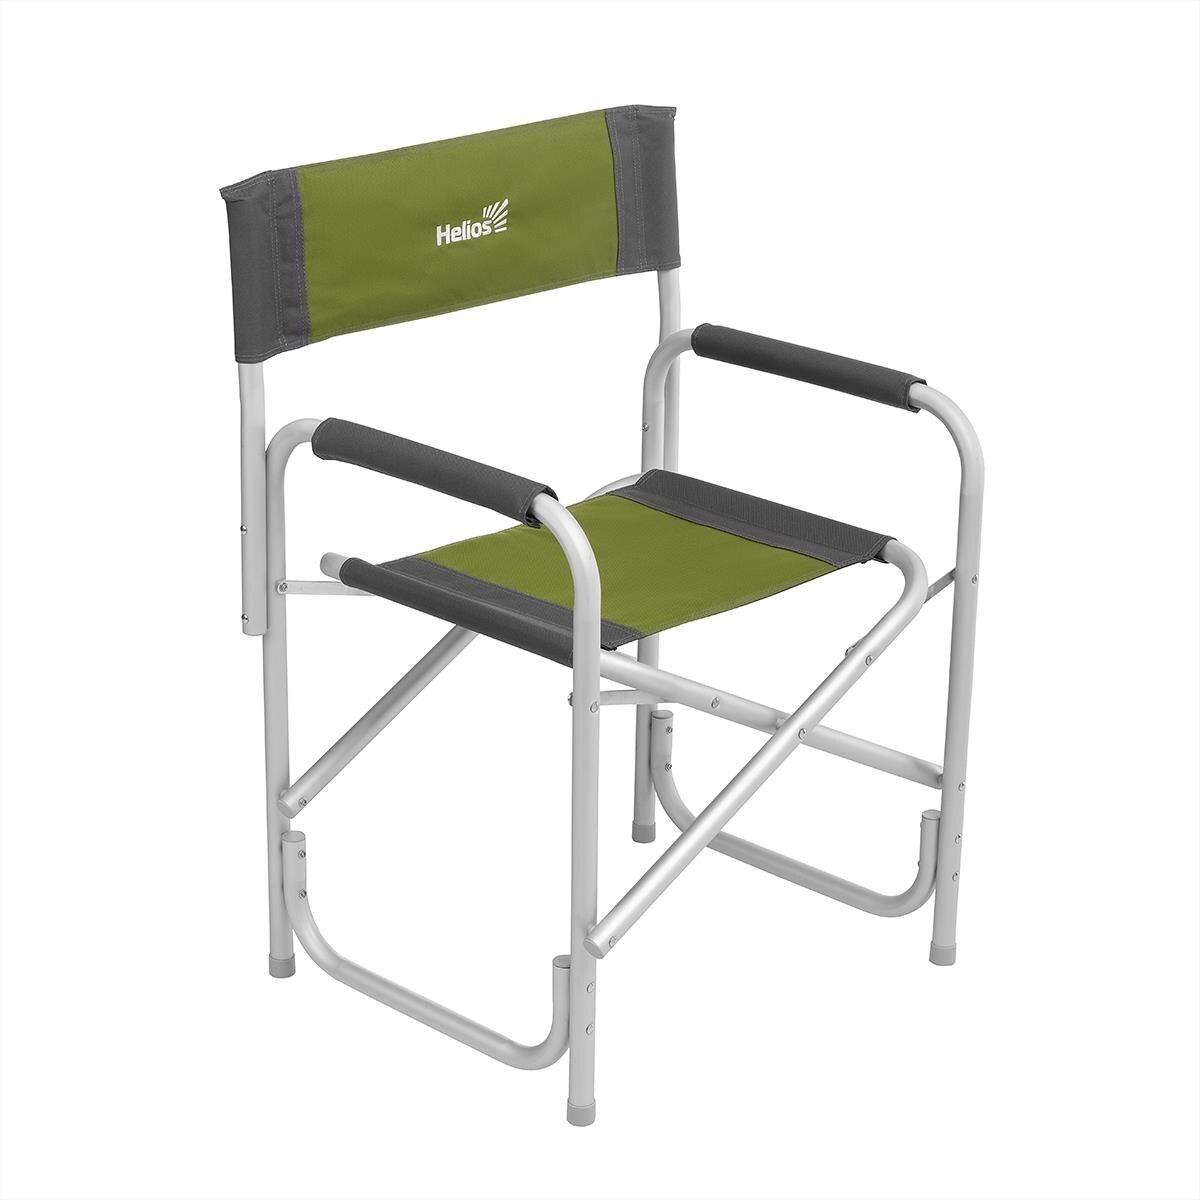 Disciplined Executive Chair (hs-95200) Helios